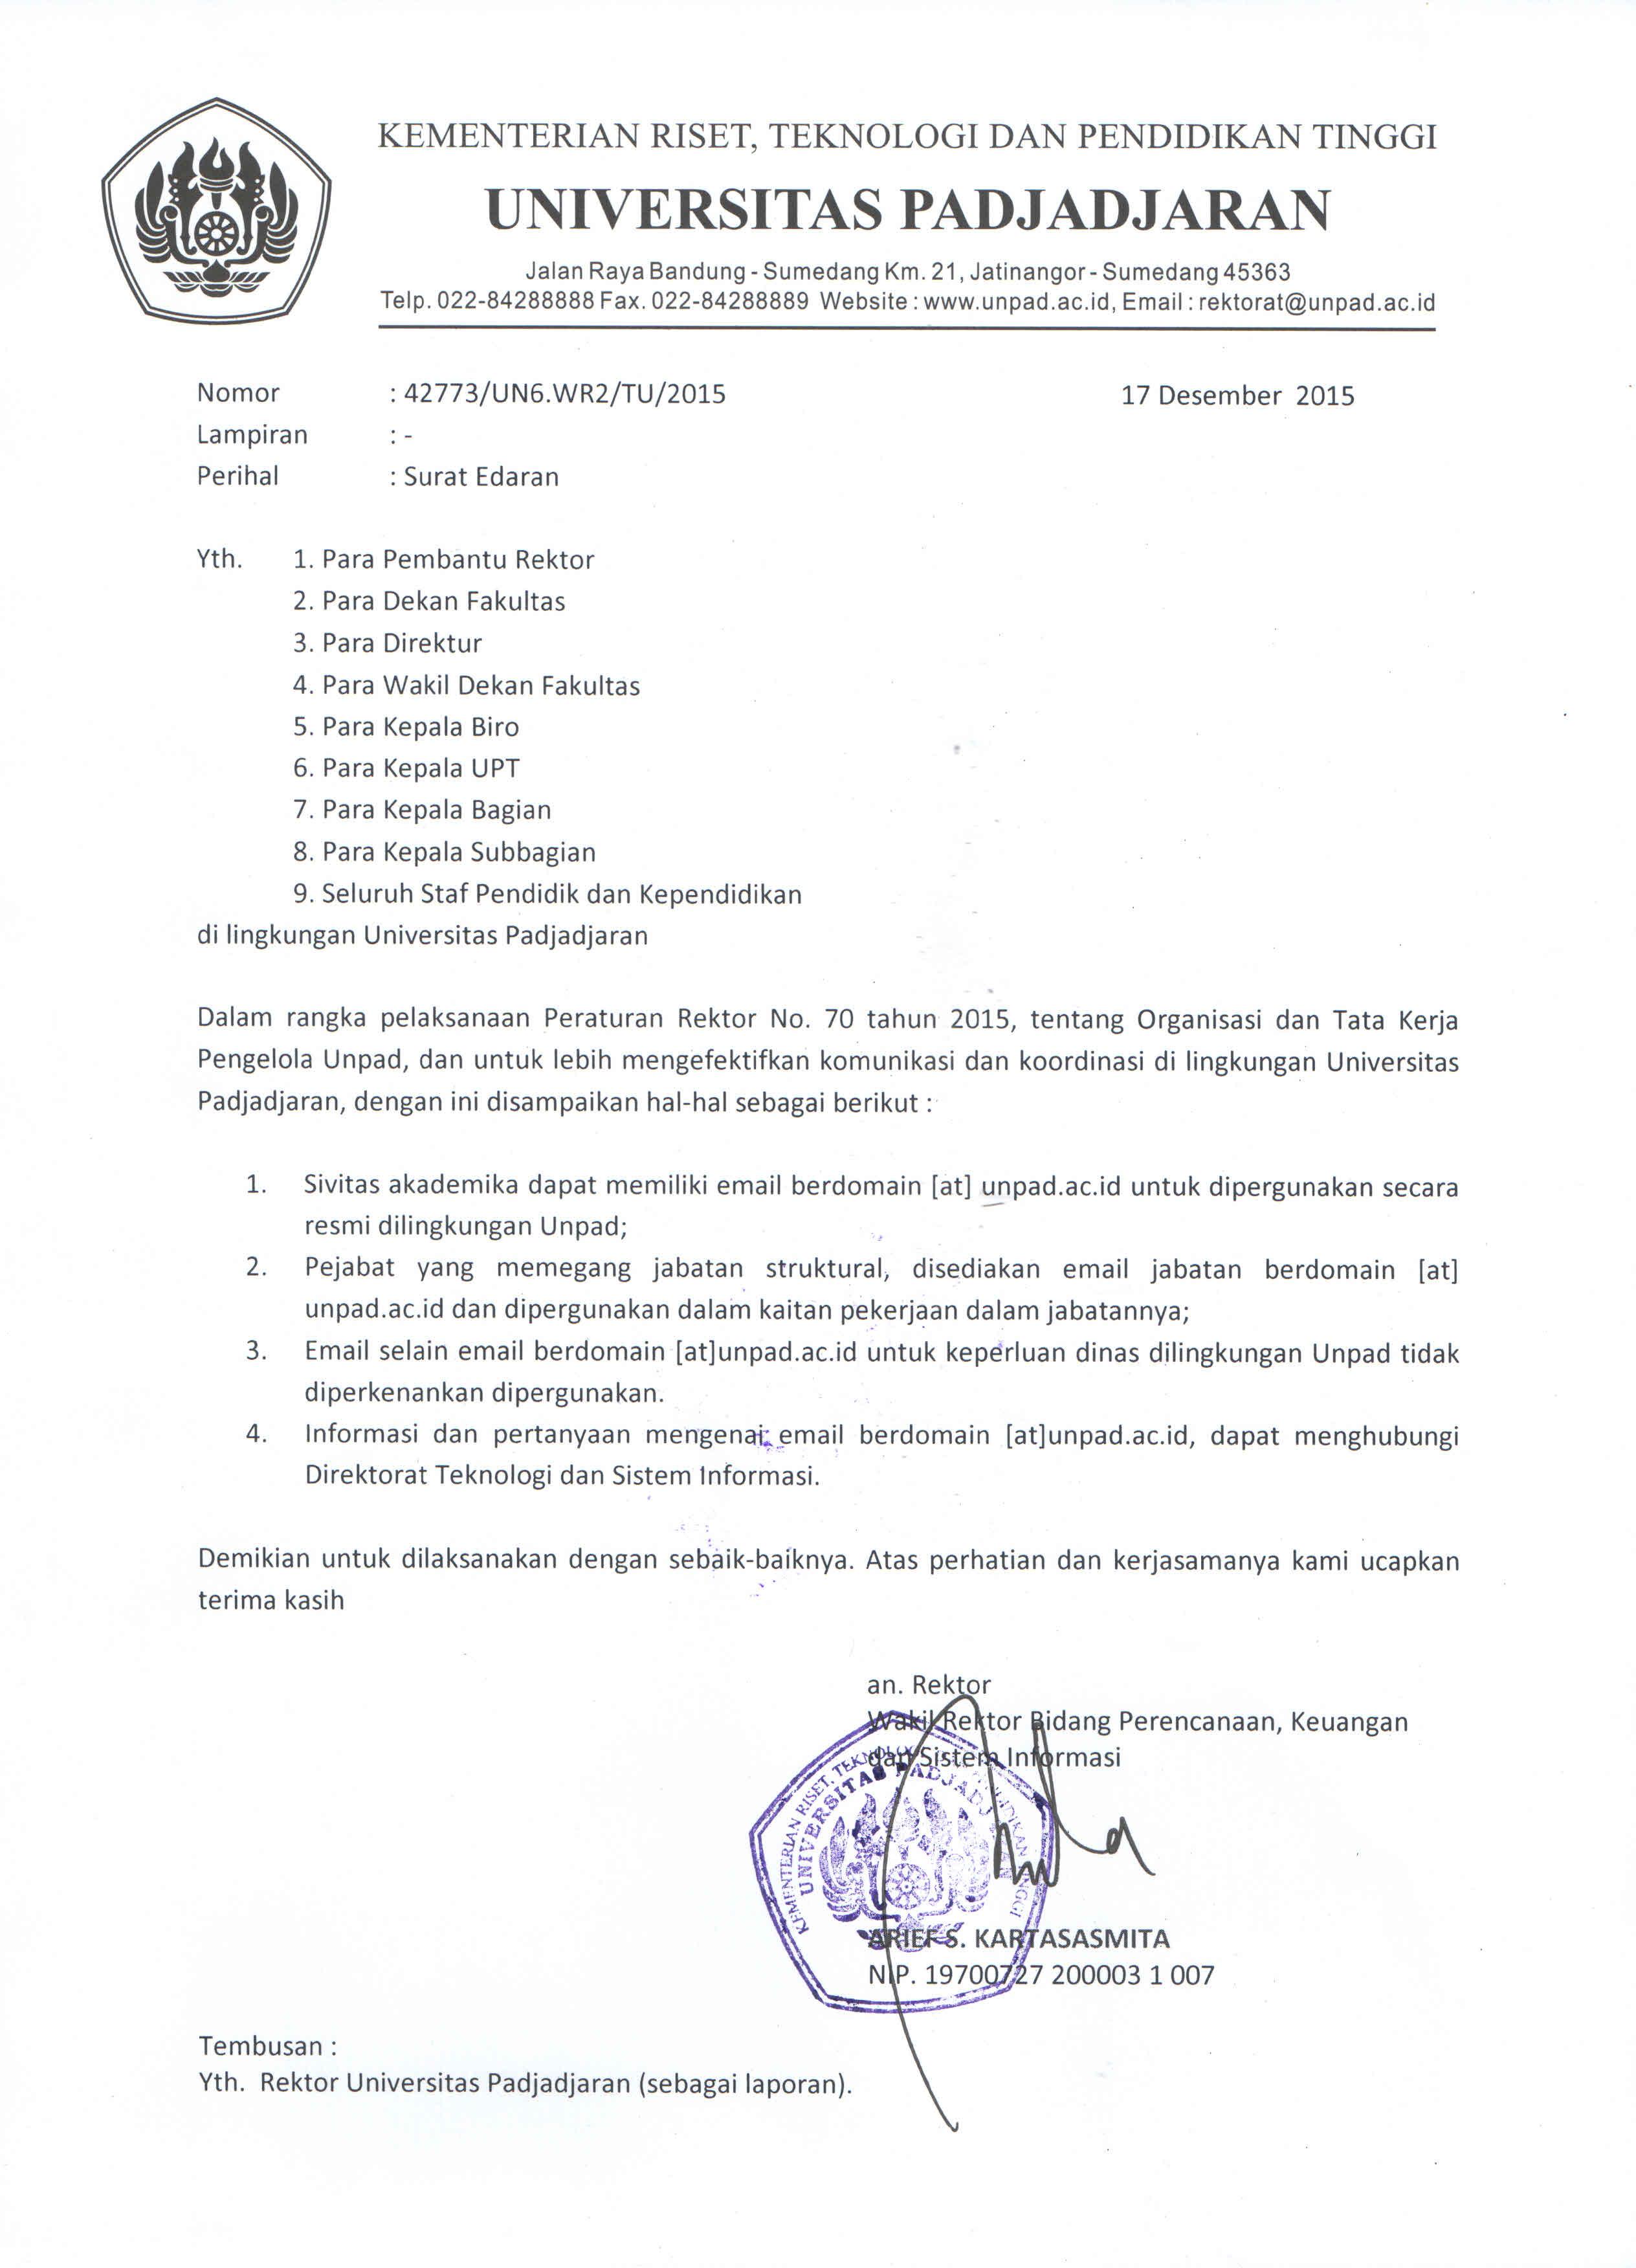 Surat Edaran Penggunaan Email Unpad Ac Id Universitas Padjadjaran